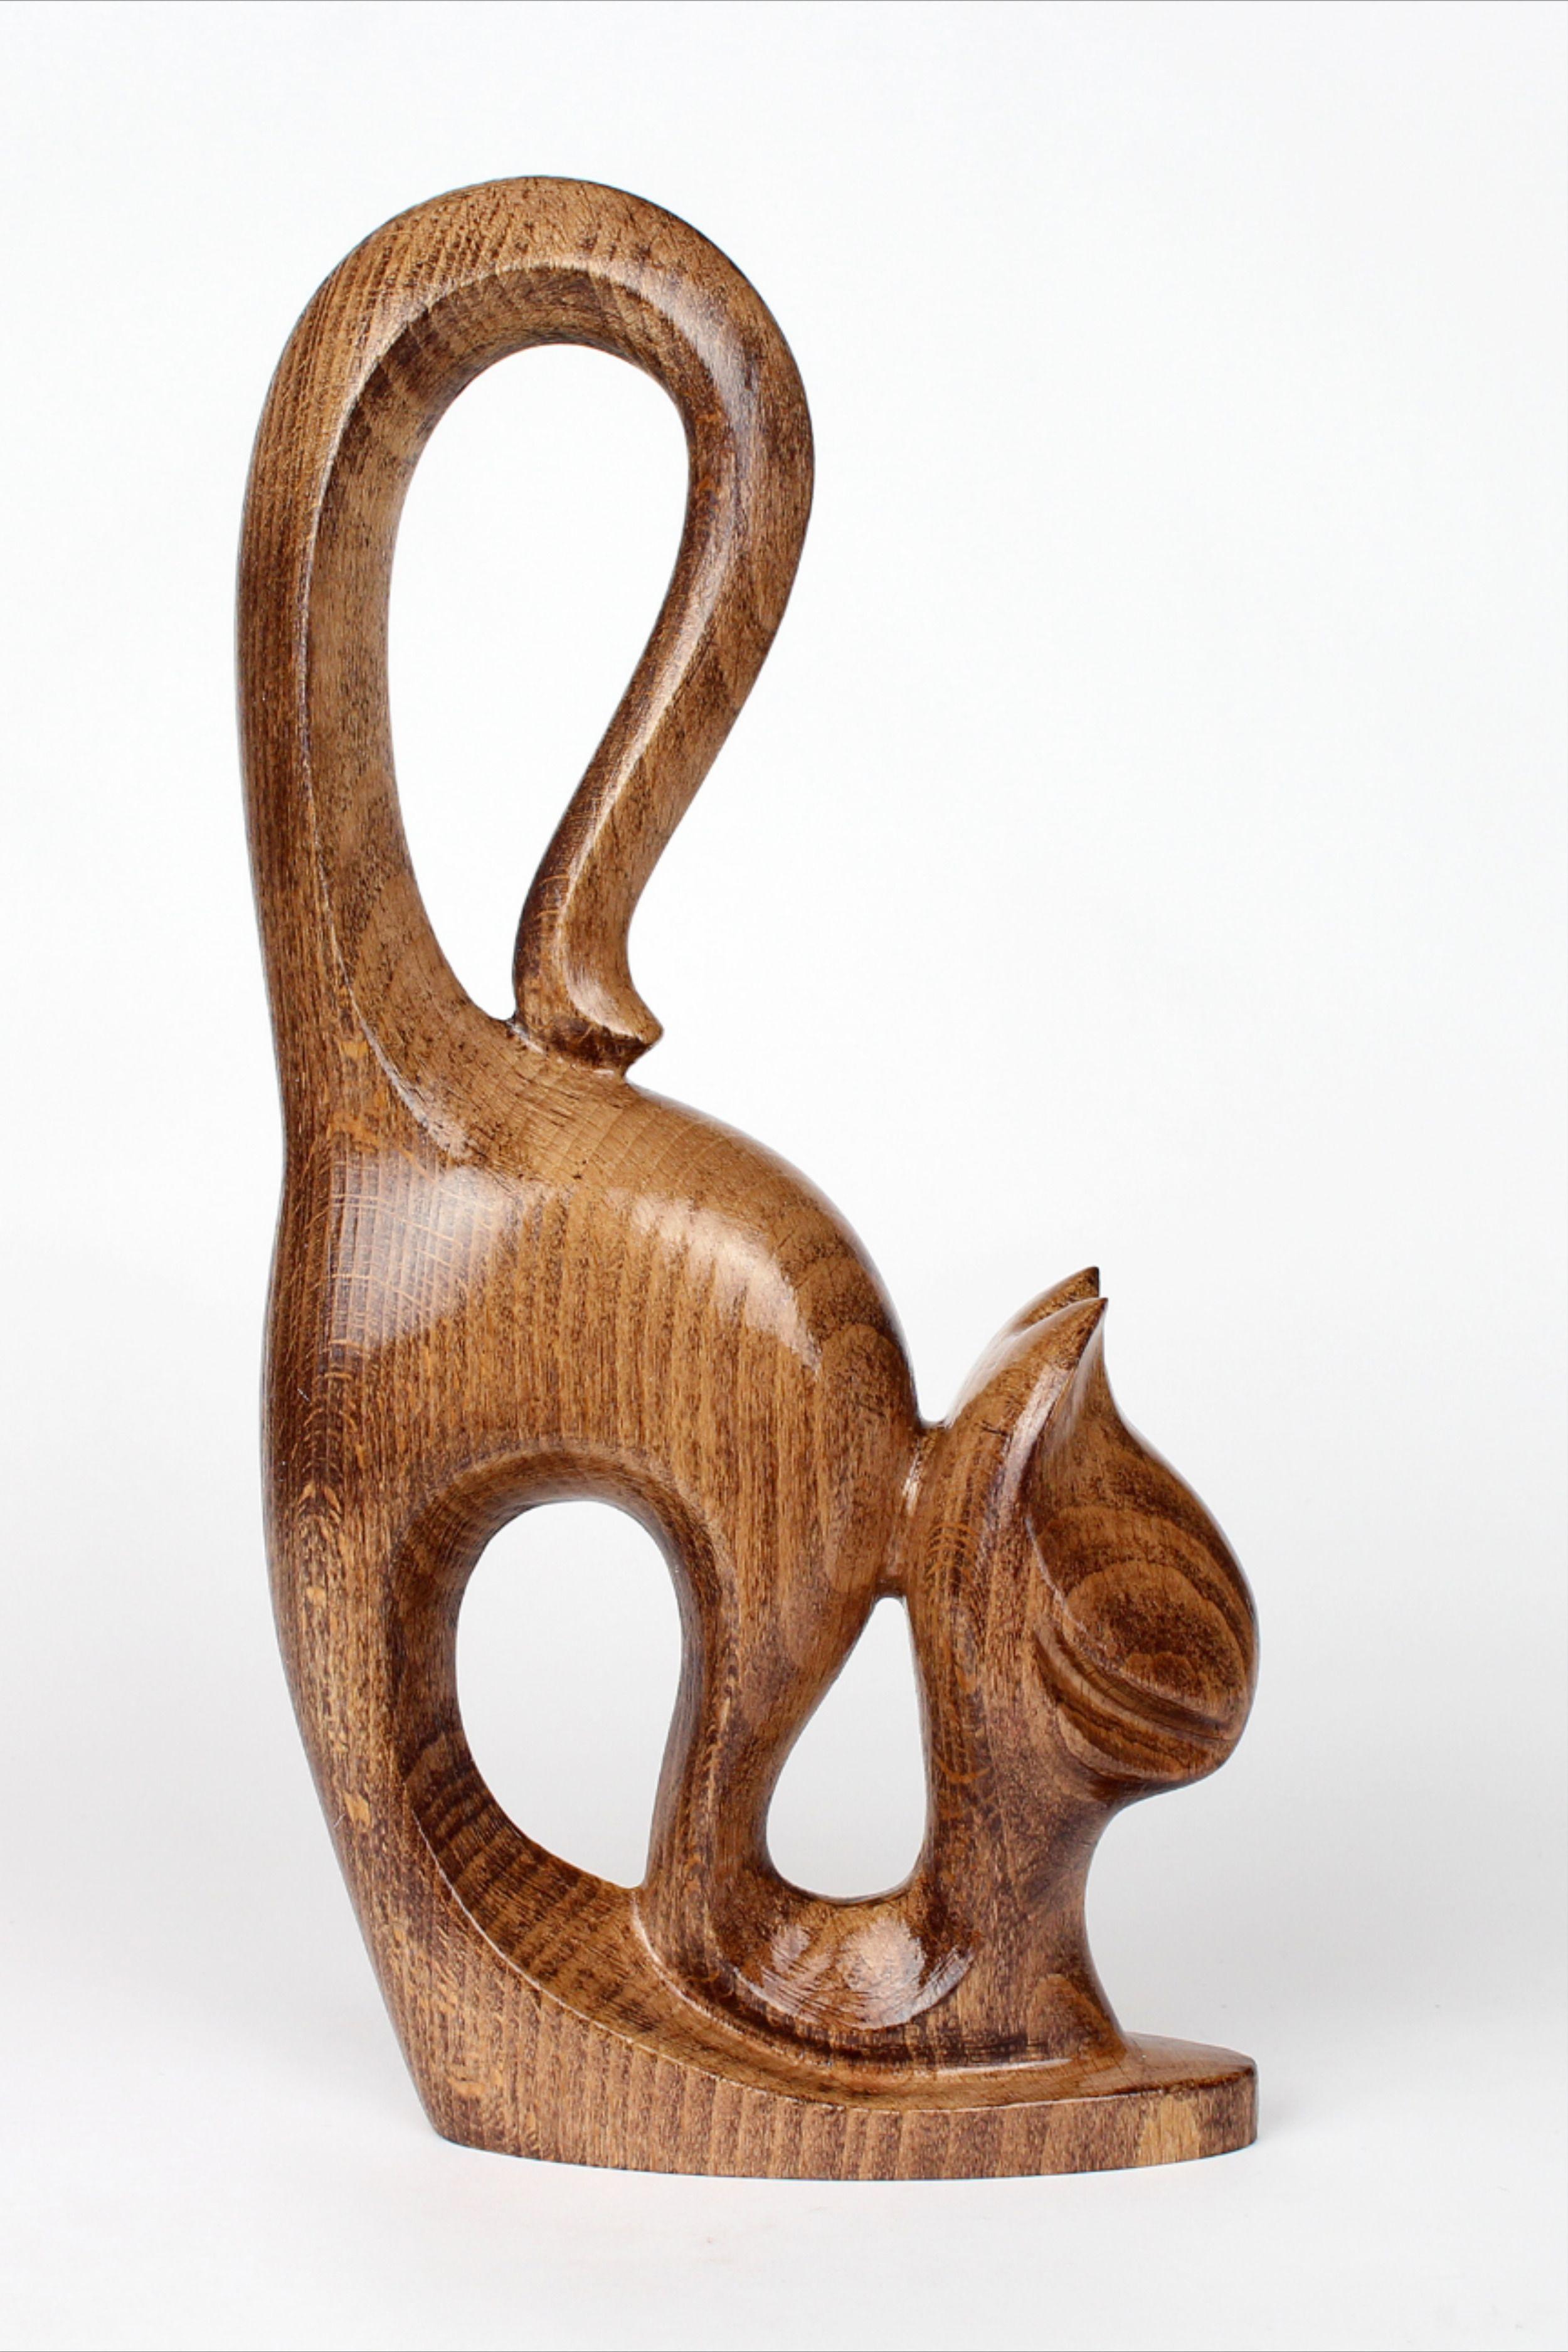 shelf decor original gift art rustic sculpture figurines christmas gift Ceramic sculpture garden ceramics